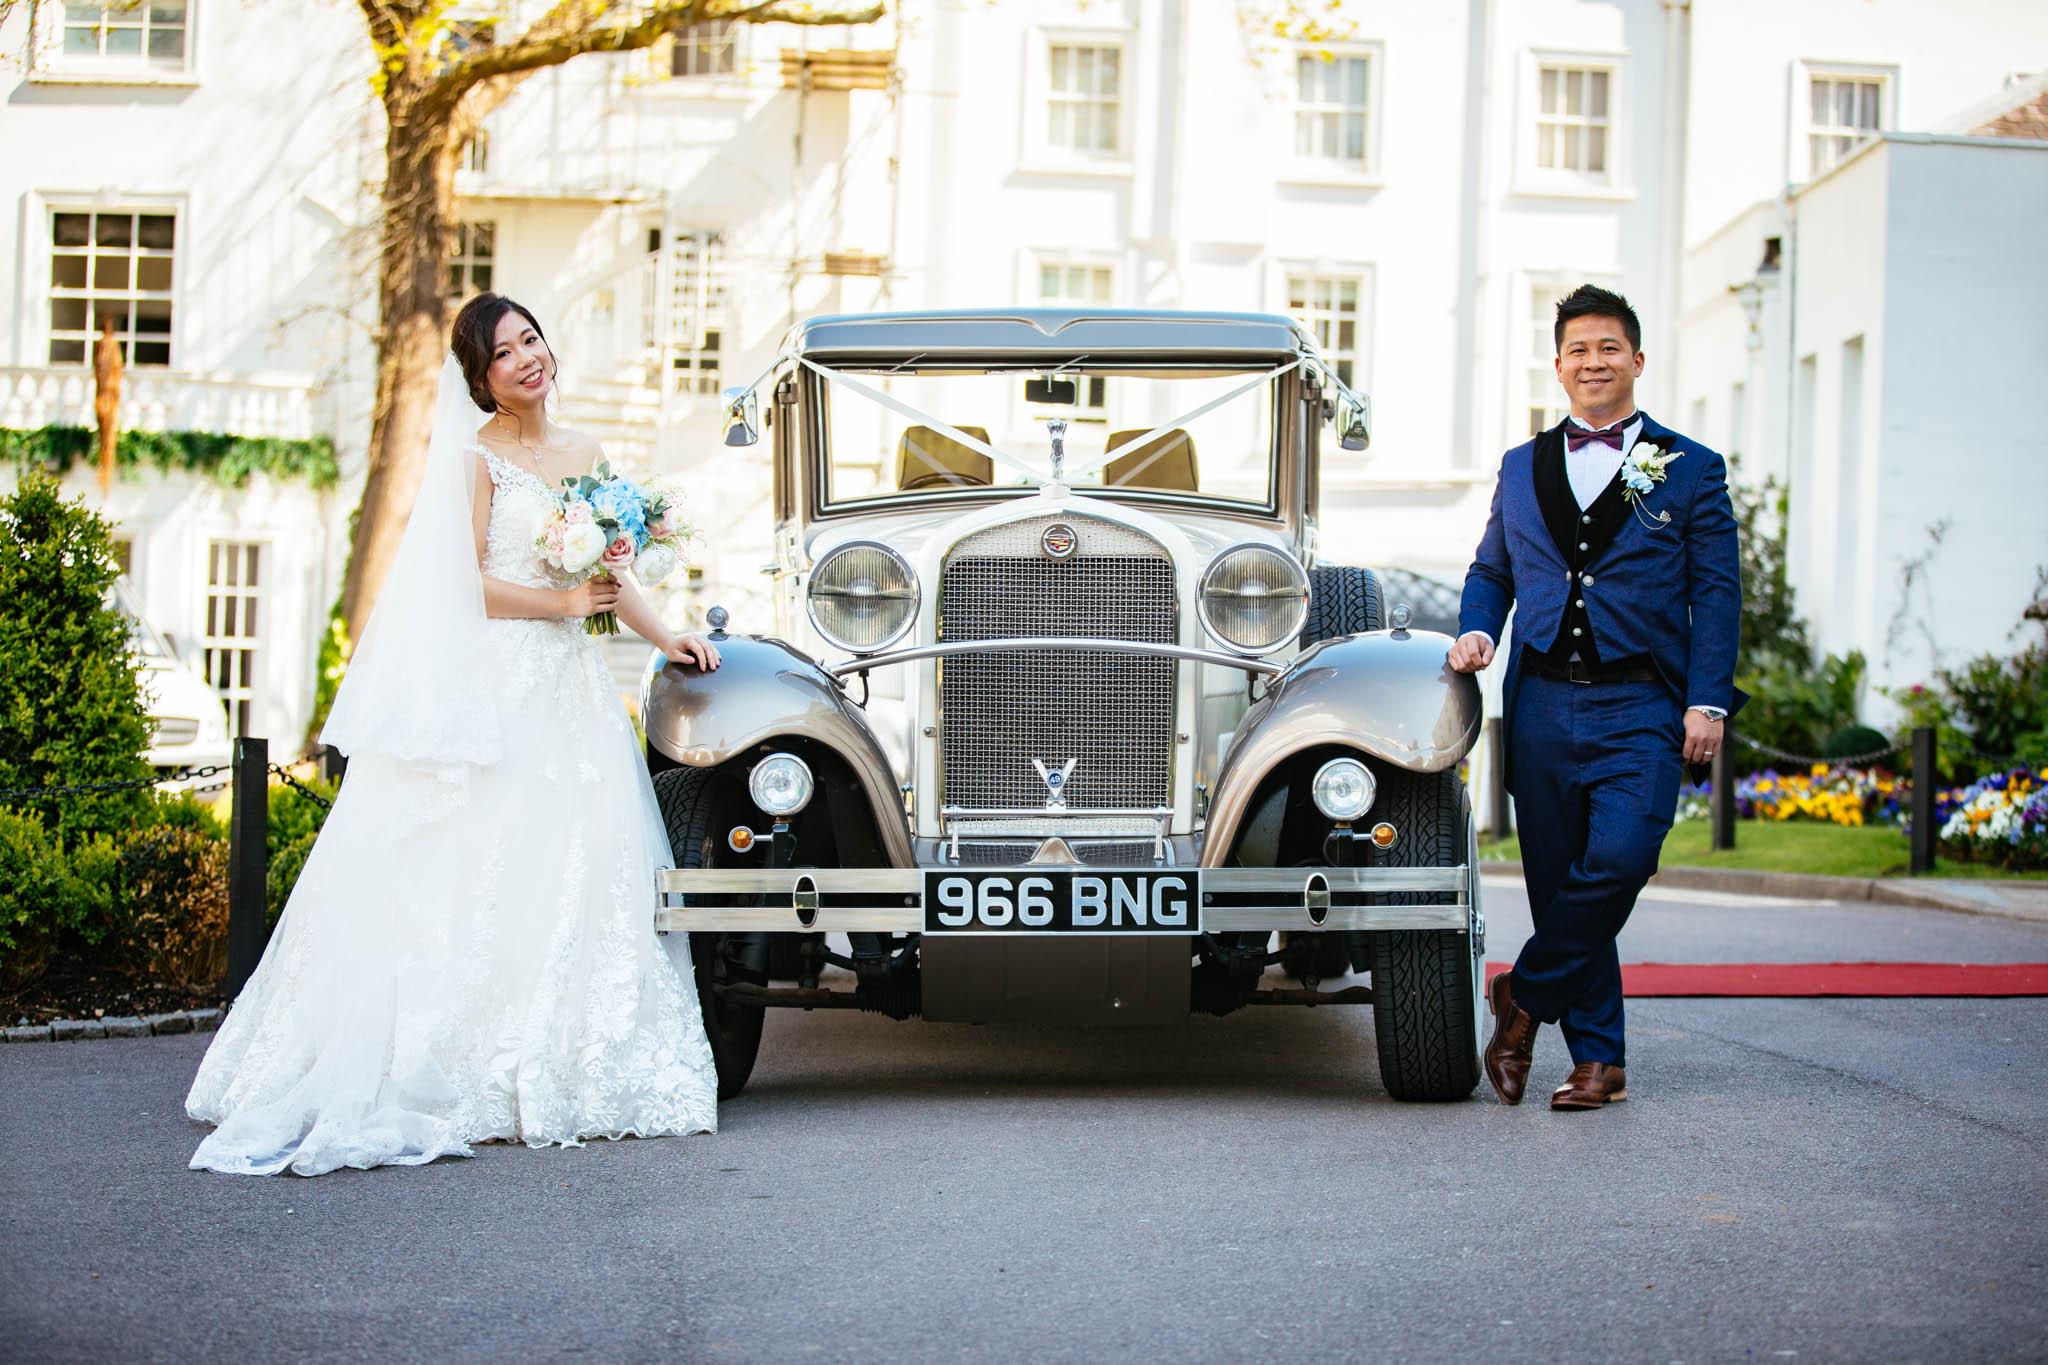 Kingston_All_Saint_church_Beaumont_Estate_Wedding_Photography_Ada_Davion